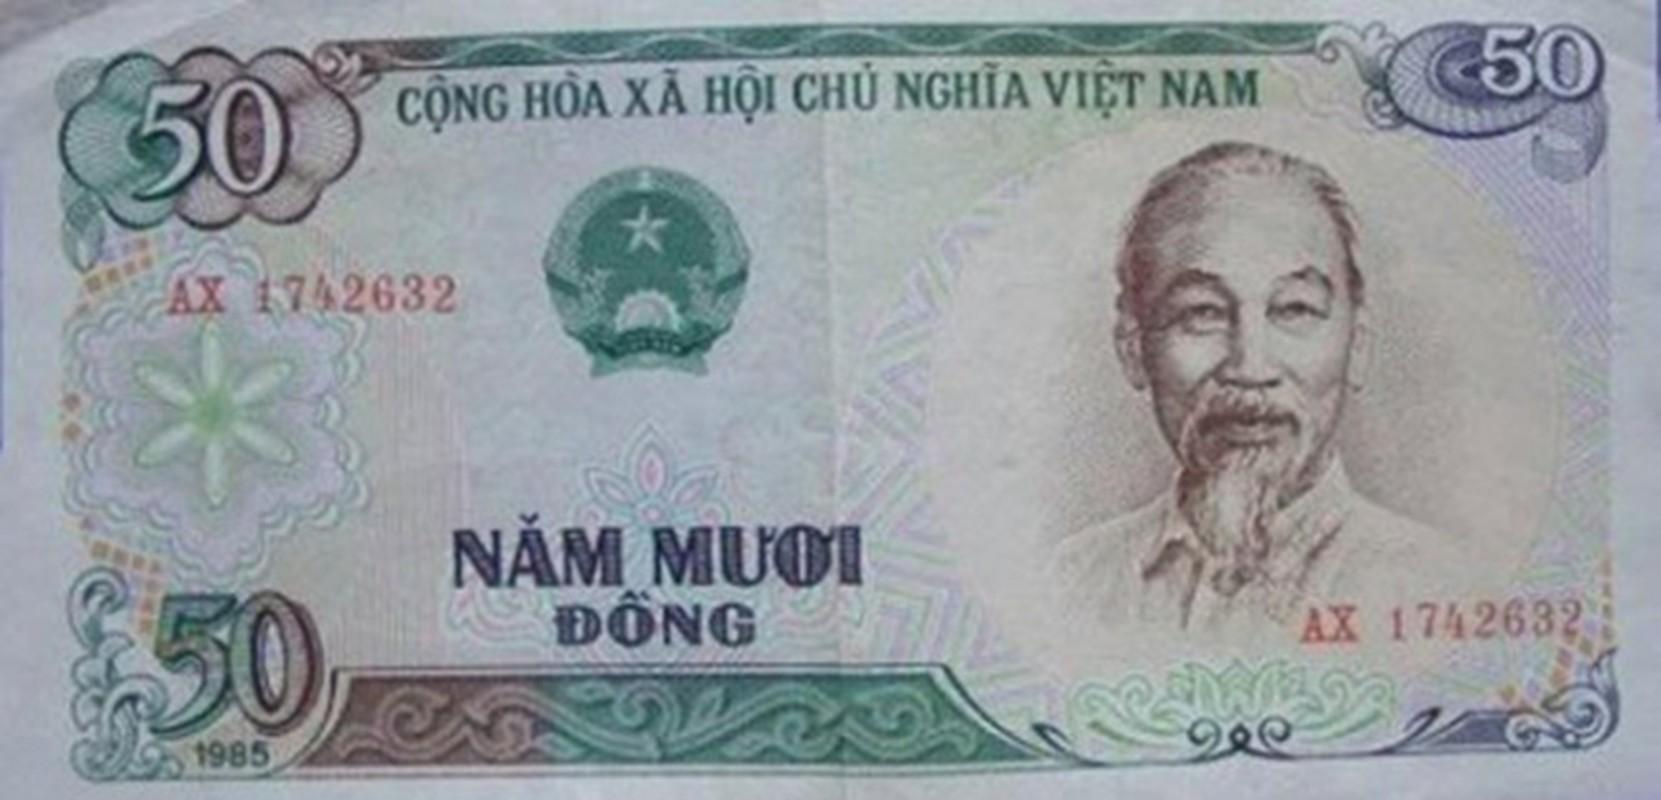 Hoai niem nhung dong tien giay mot thoi cua Viet Nam-Hinh-11